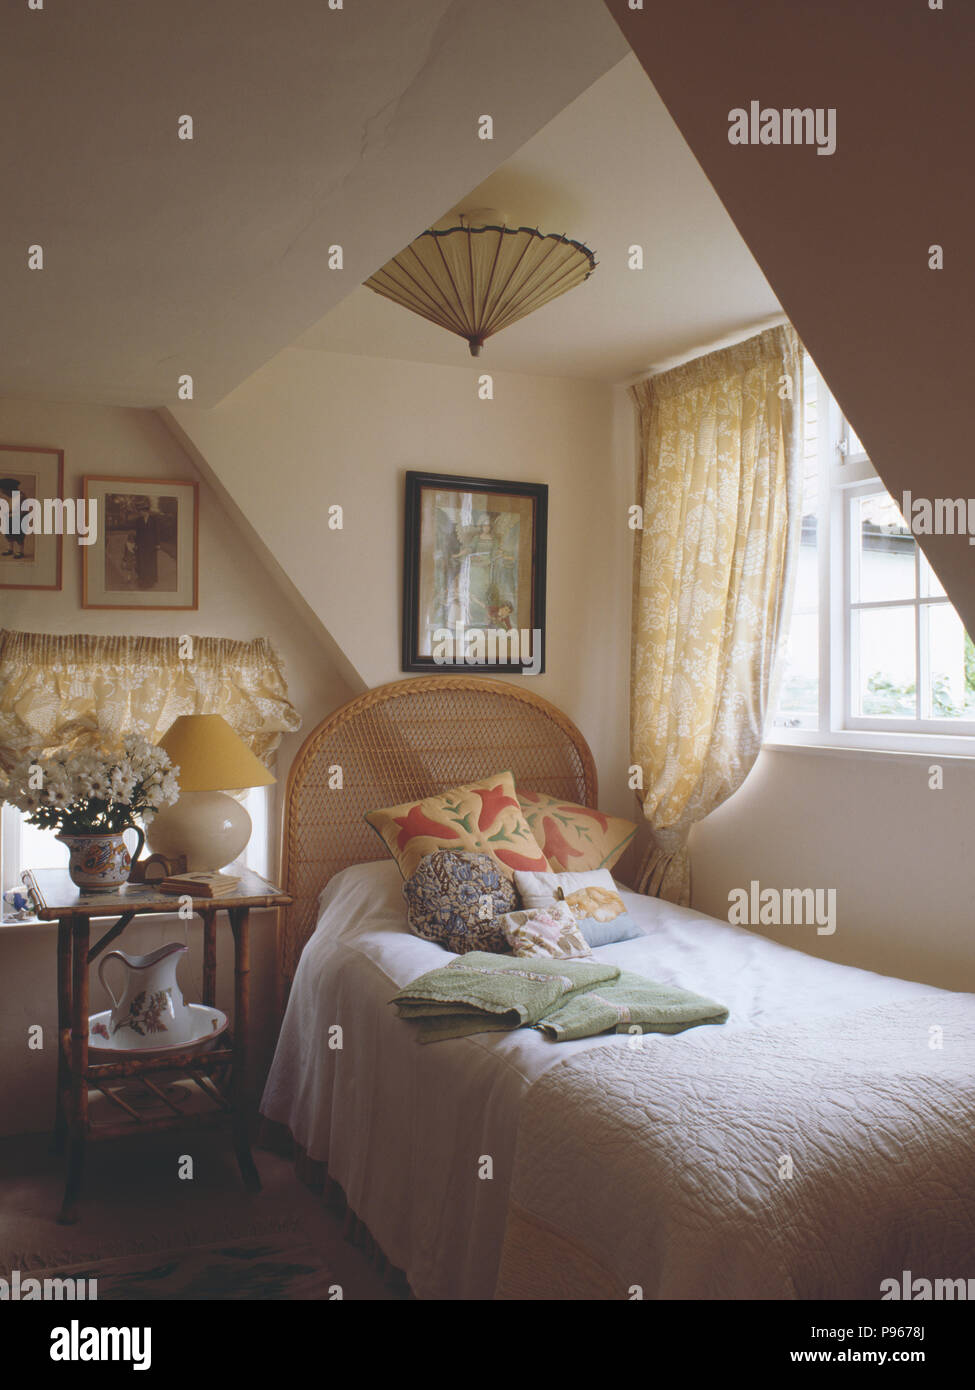 Bambus-Tisch neben Einzelbett unter Fenster im Dachgeschoss ...